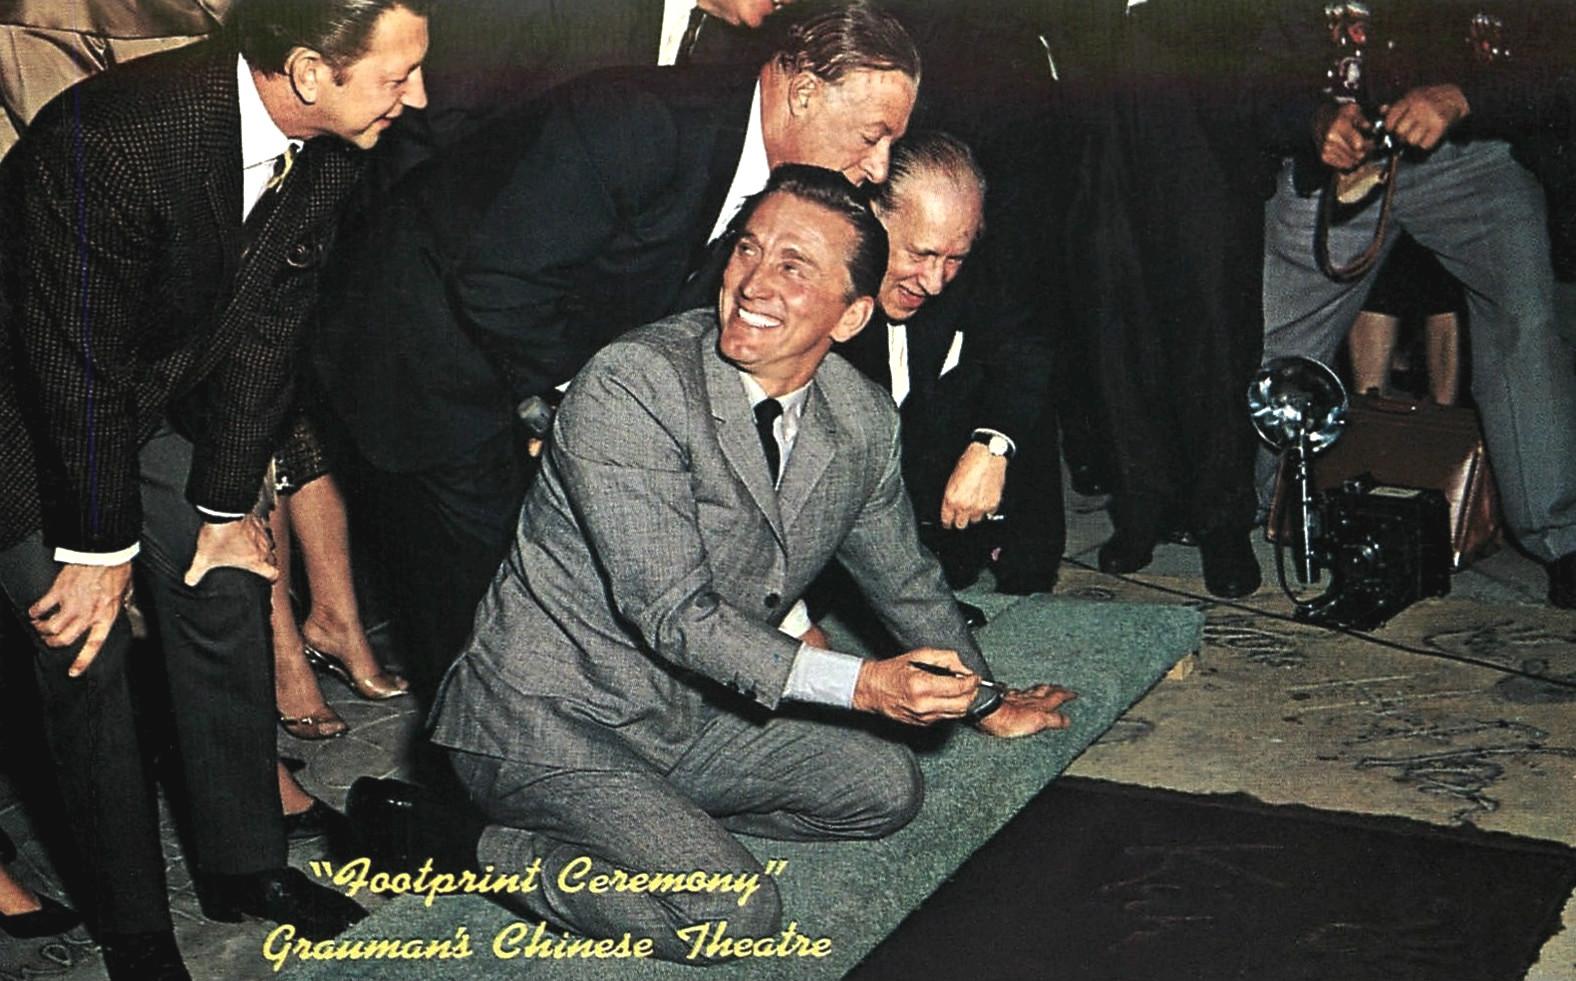 Kirk_Douglas_ceremony_Graumans_Chinese_Theatre_1962.jpg